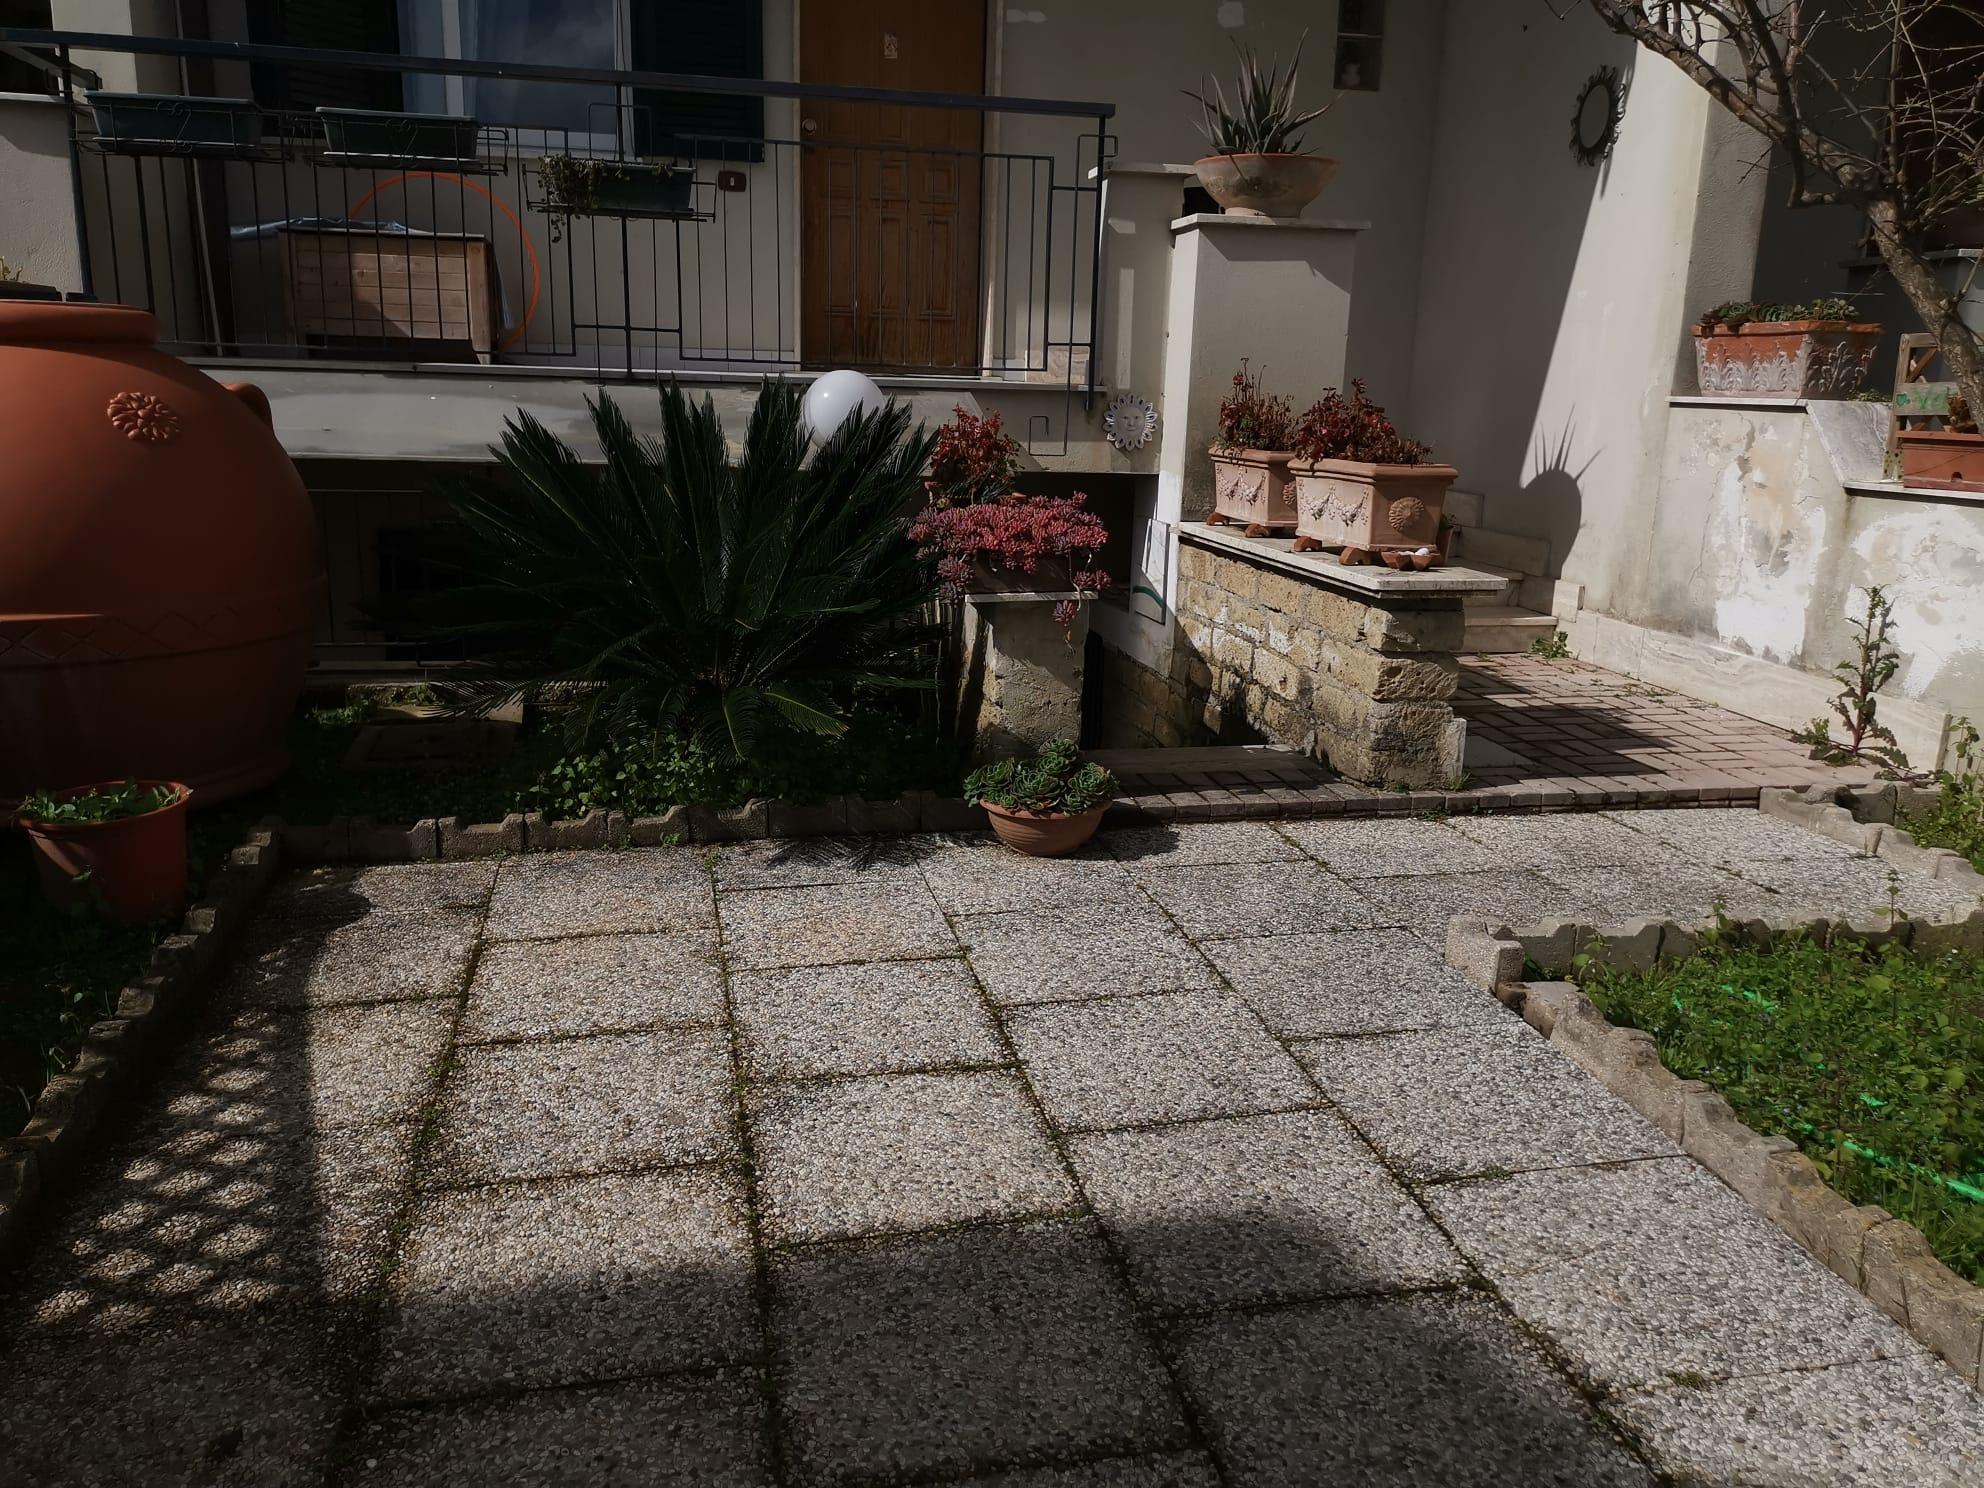 VILLA A SCHIERA IN PARCO Varcaturo-Tangenziale Rif 36141